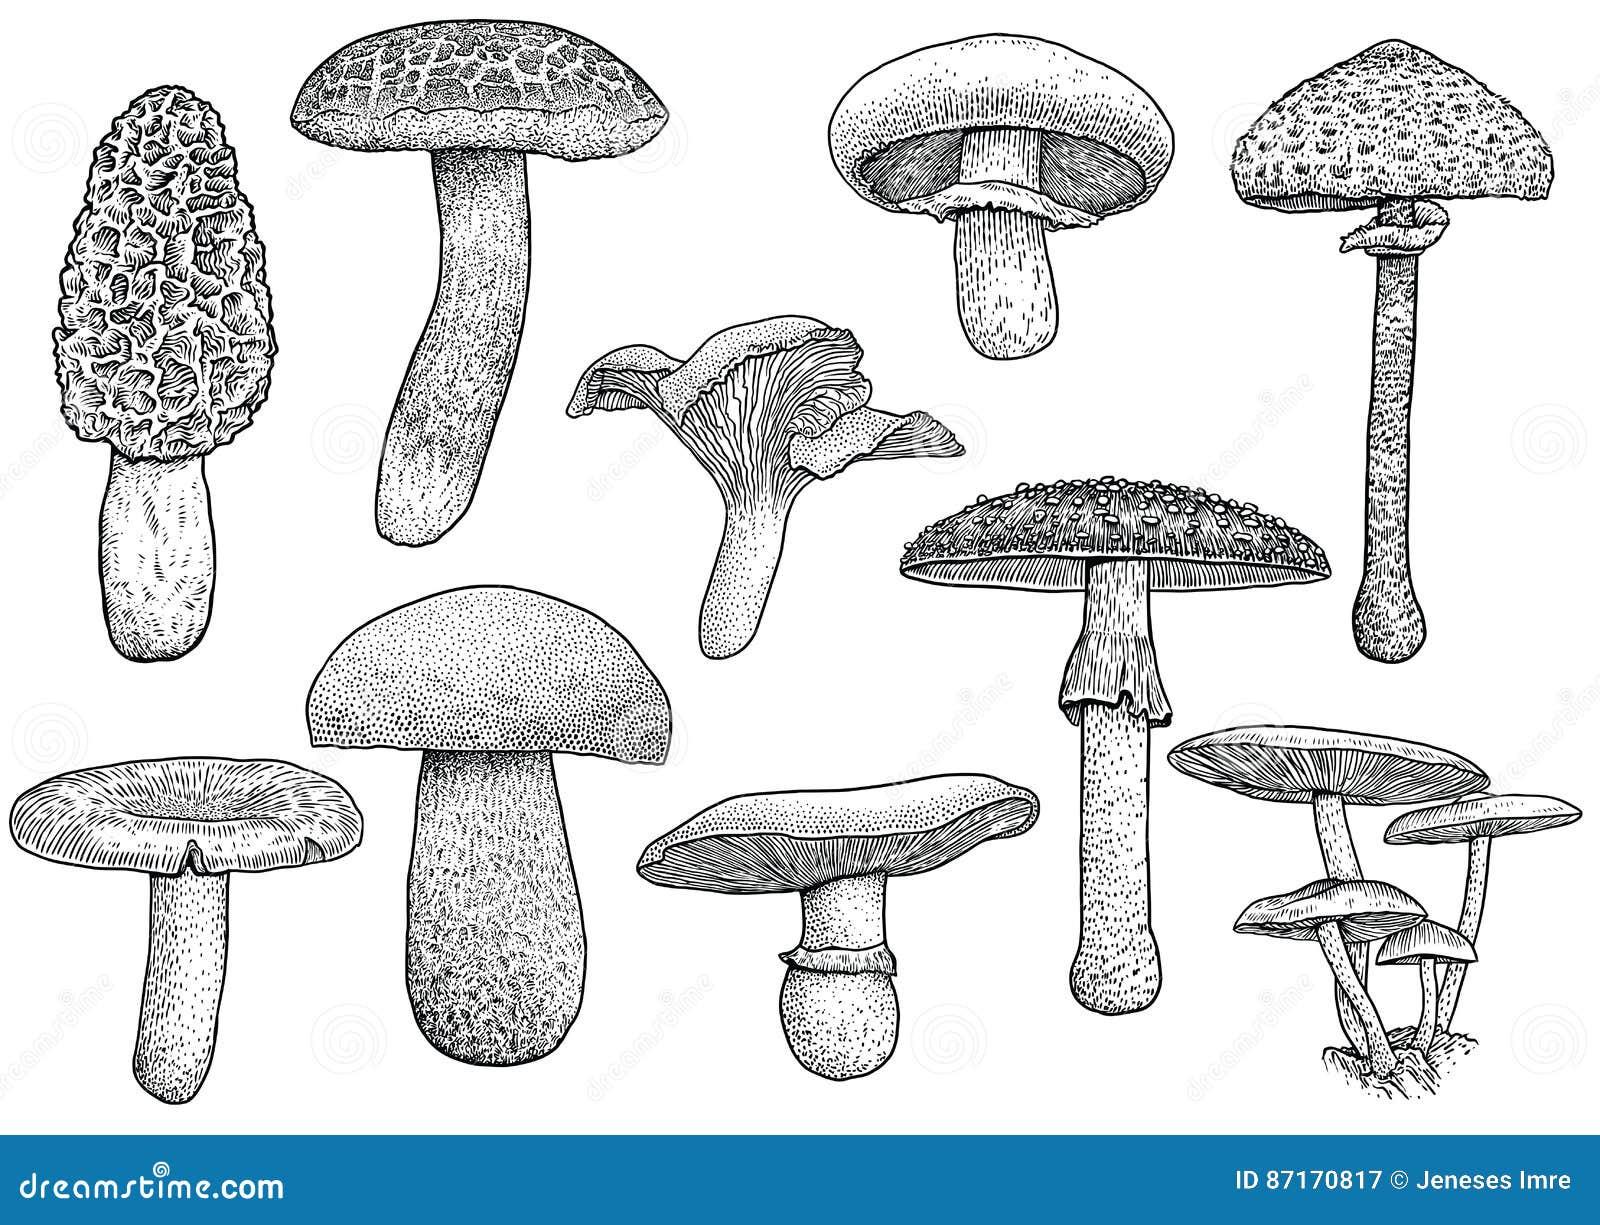 Group Of Mushroom Illustration Drawing Engraving Vector